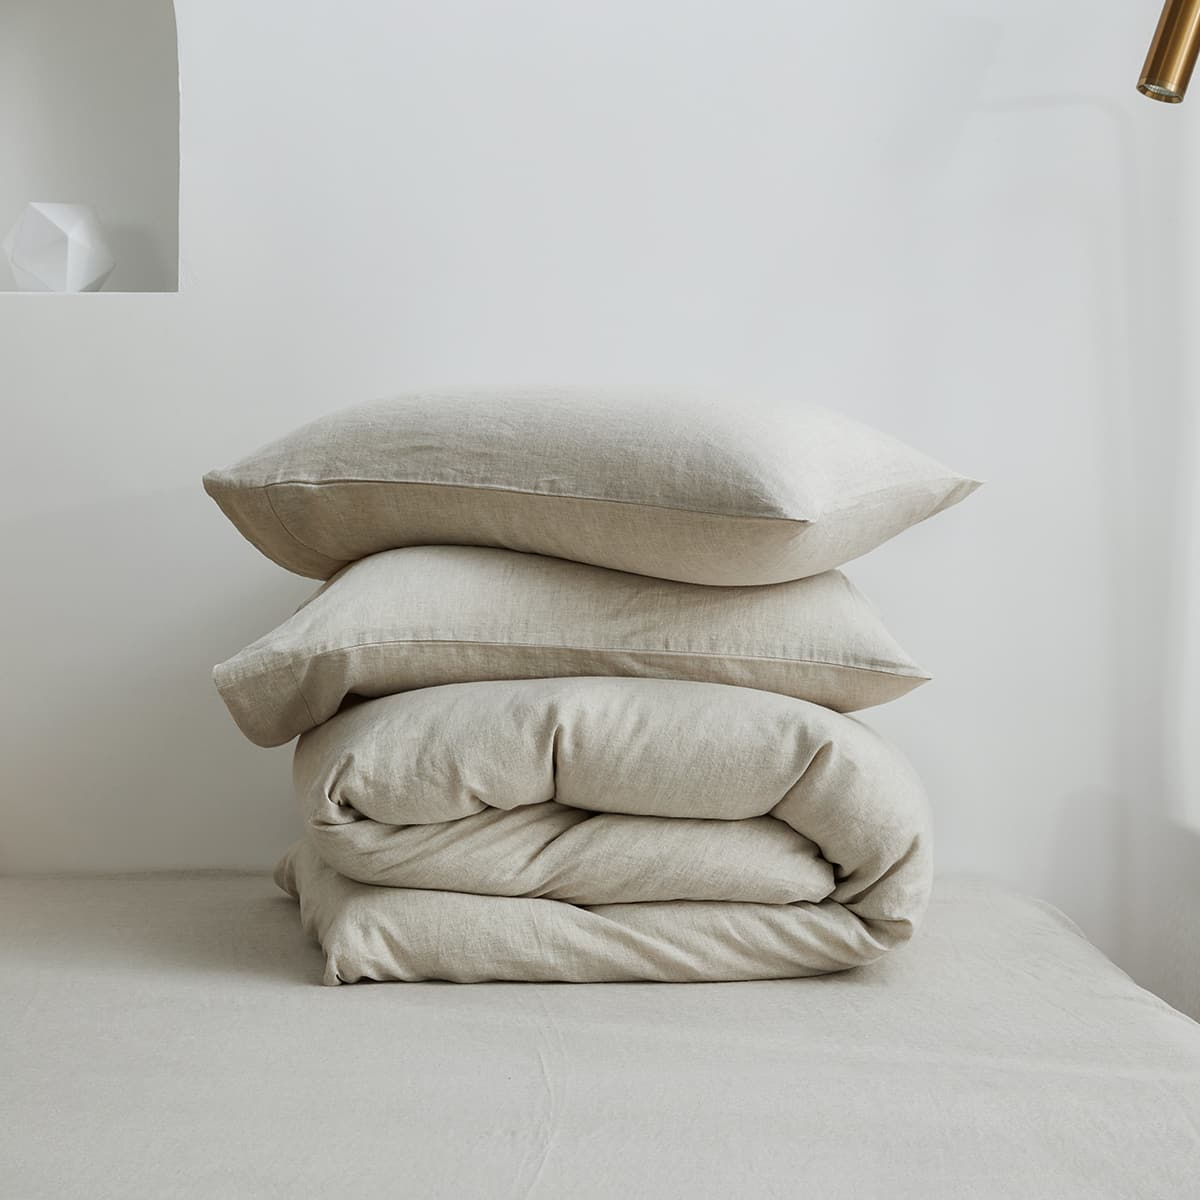 Home - Luxury Bed Linen OEM Manufacturer 2